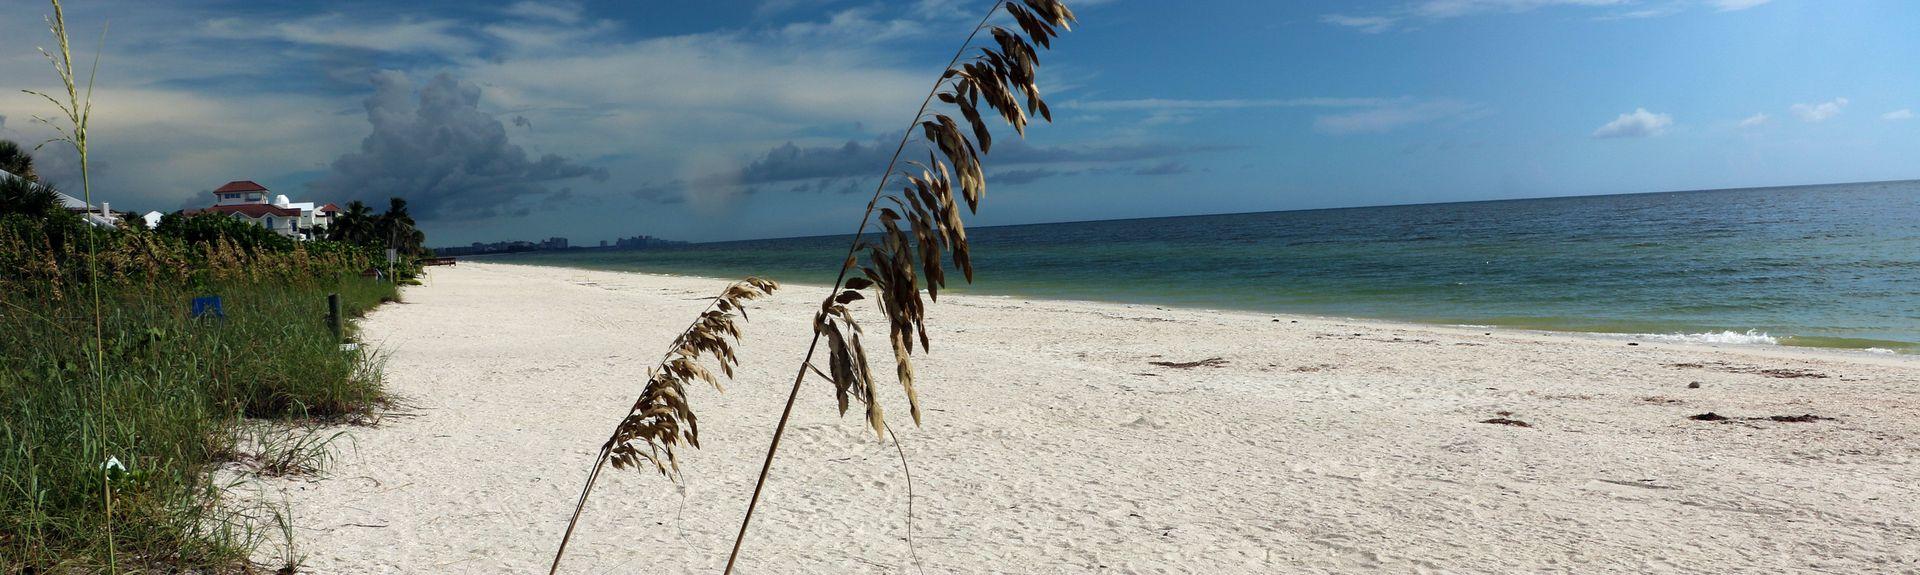 Bonita Bay, Bonita Springs, FL, USA